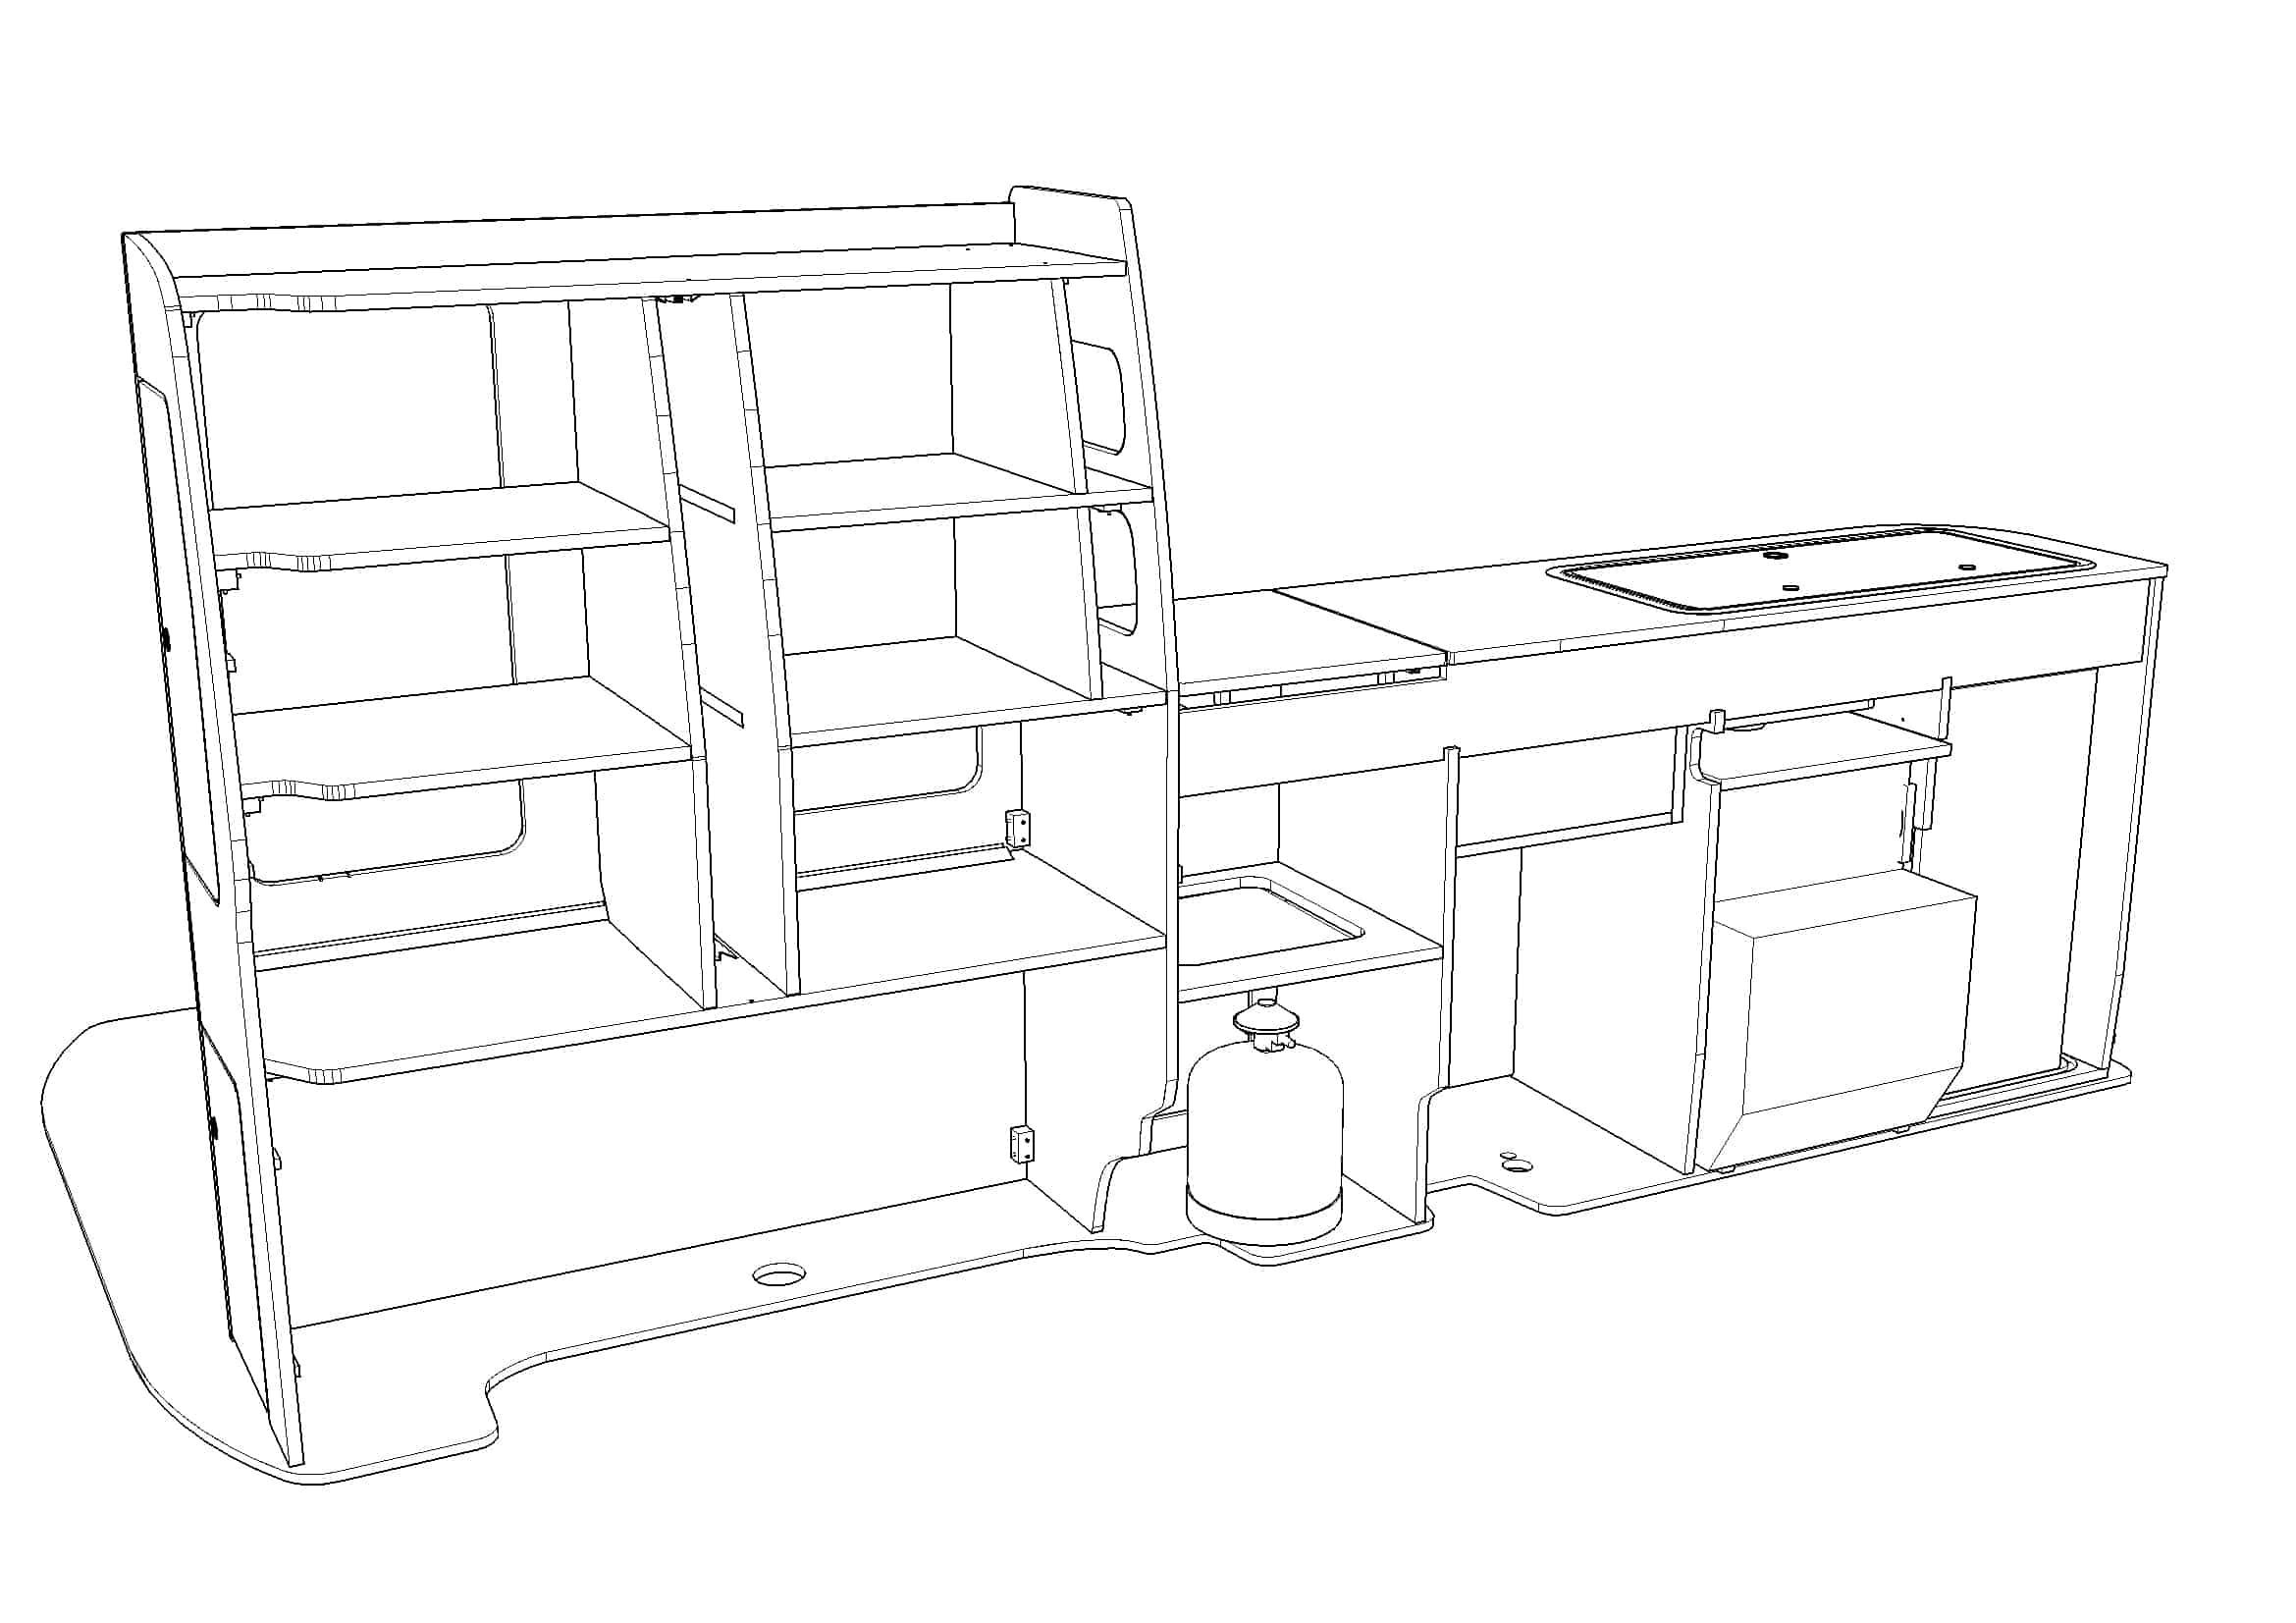 Evo 5f Vw Lwb Curved Kit Front Loading Fridge Front